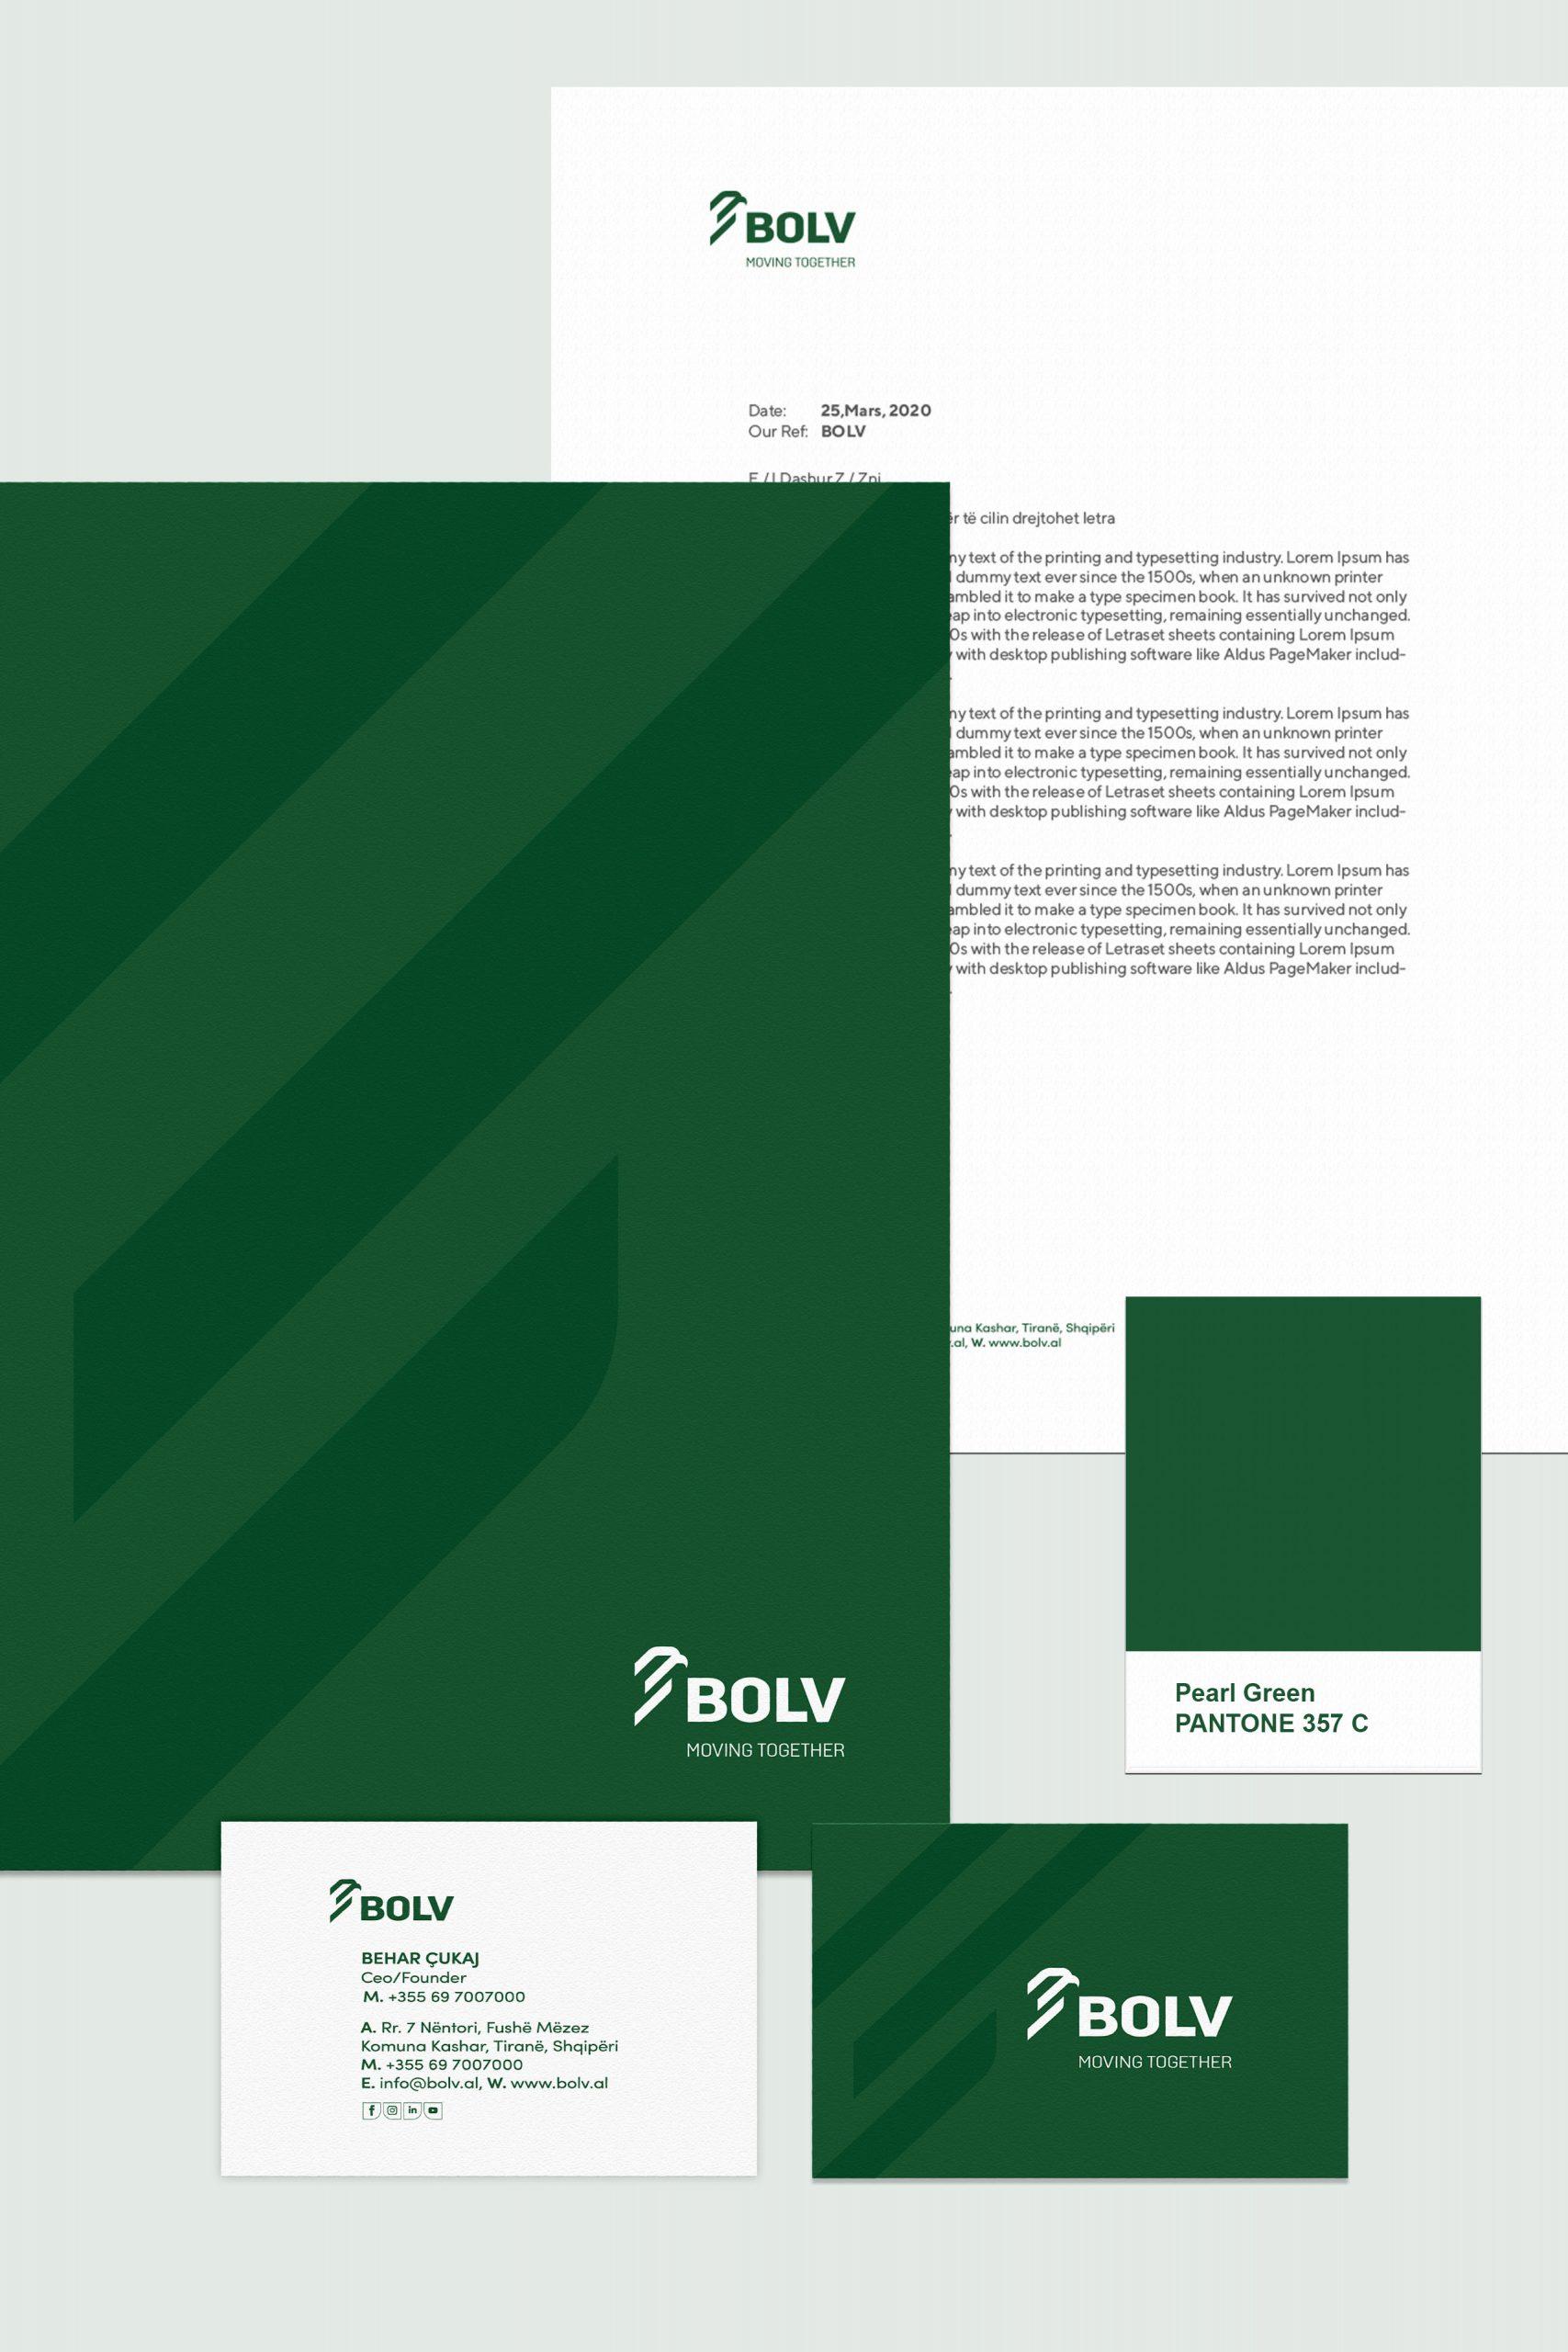 Bolv Project Img 5 - Vatra Agency / Founder & CEO Gerton Bejo